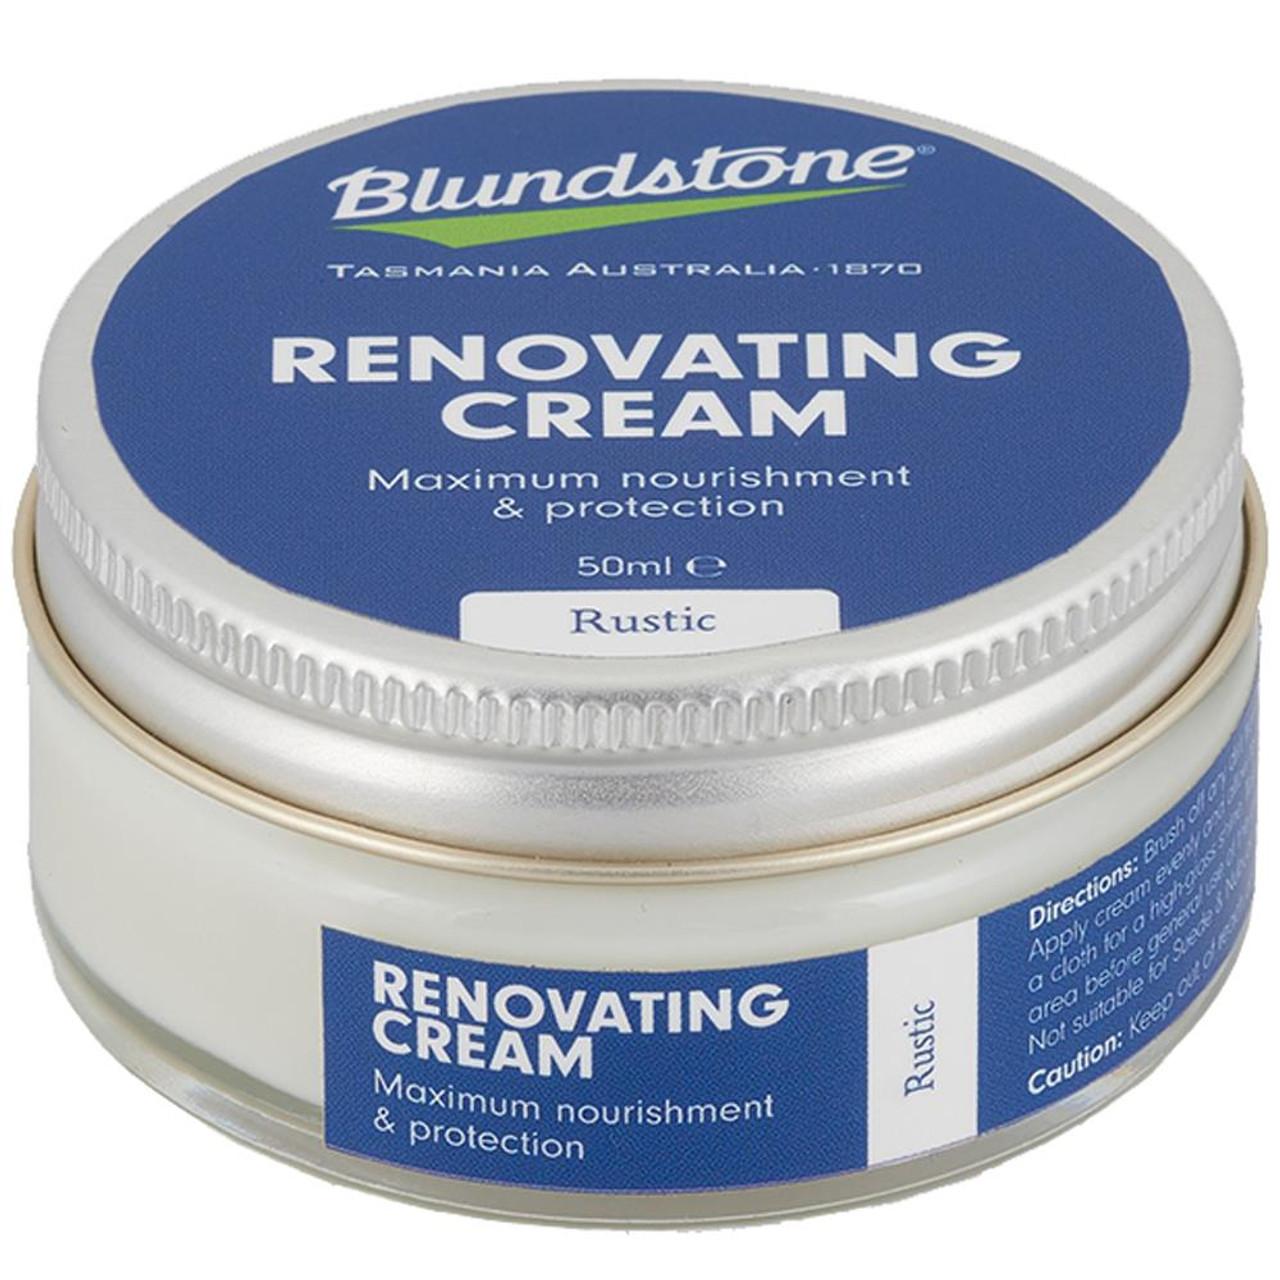 Blundstone Renovating Cream Rustic